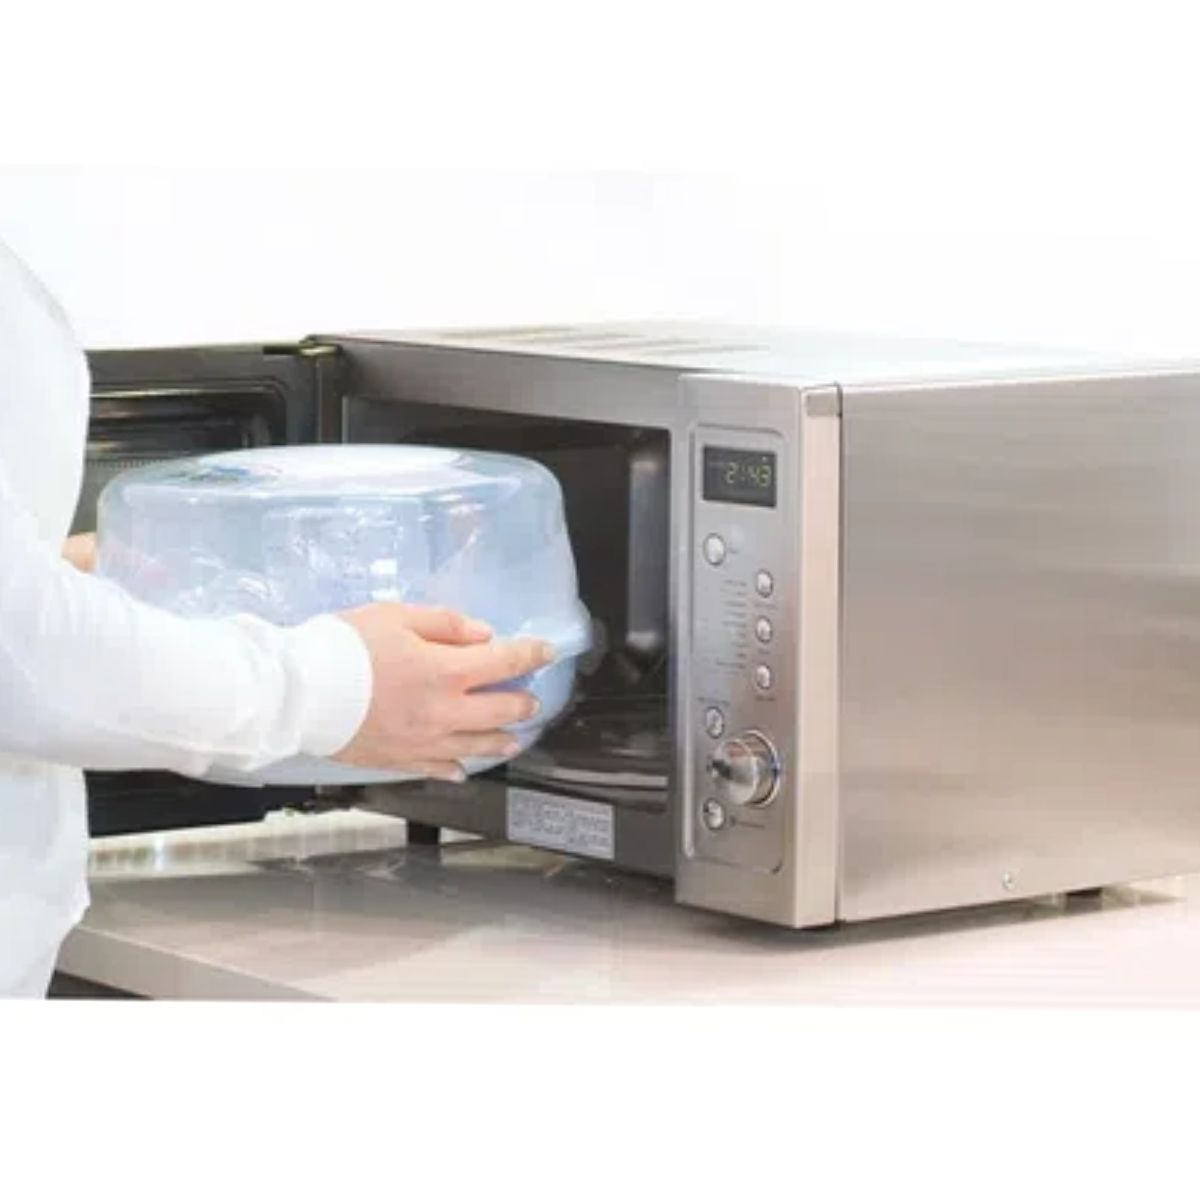 Esterilizador De Mamadeira Vapor Microondas Avent